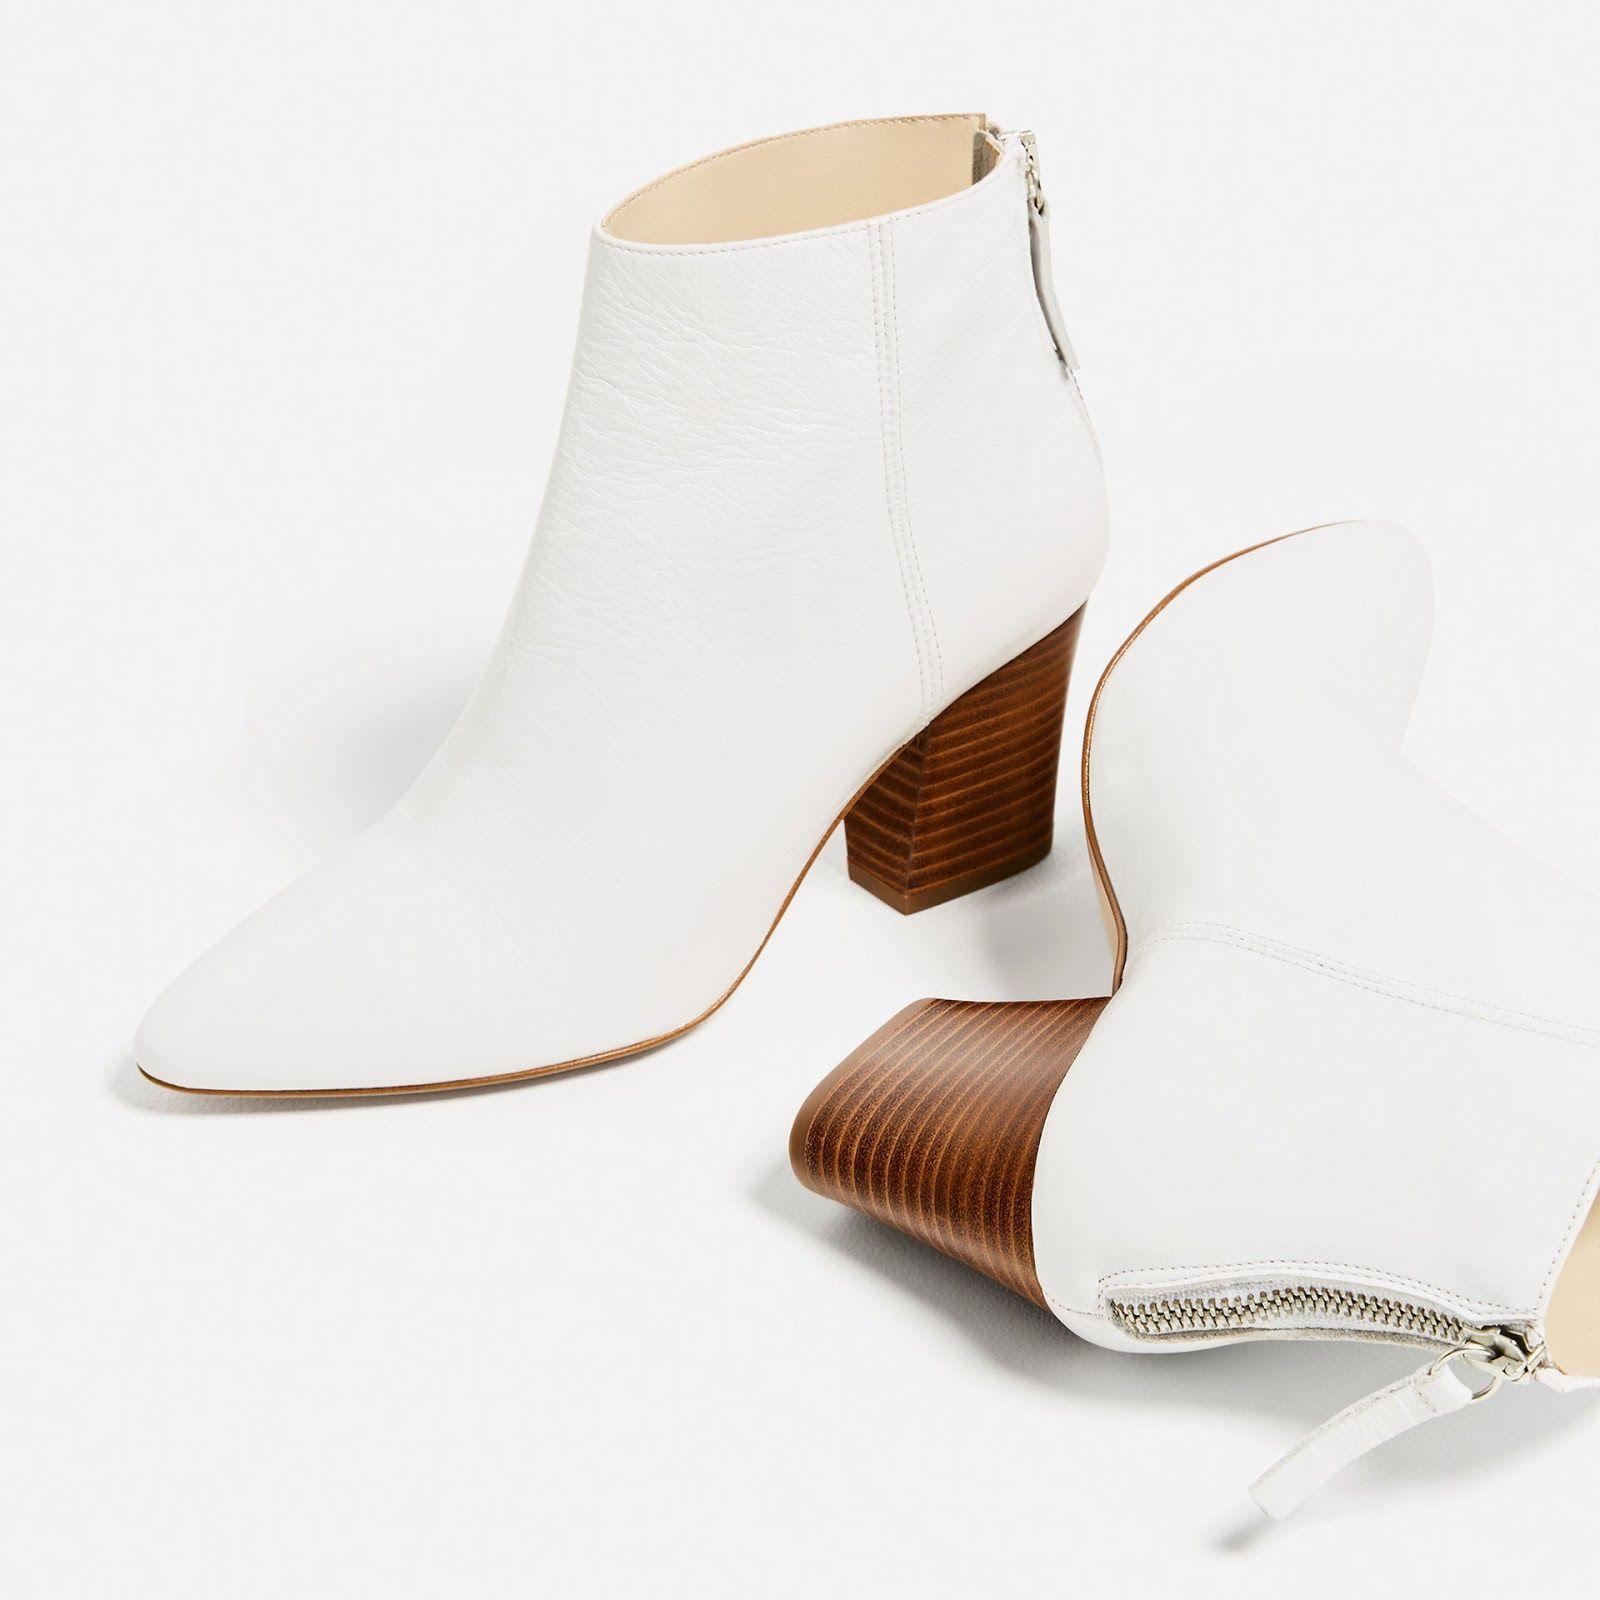 Moda no Sapatinho: botins brancos